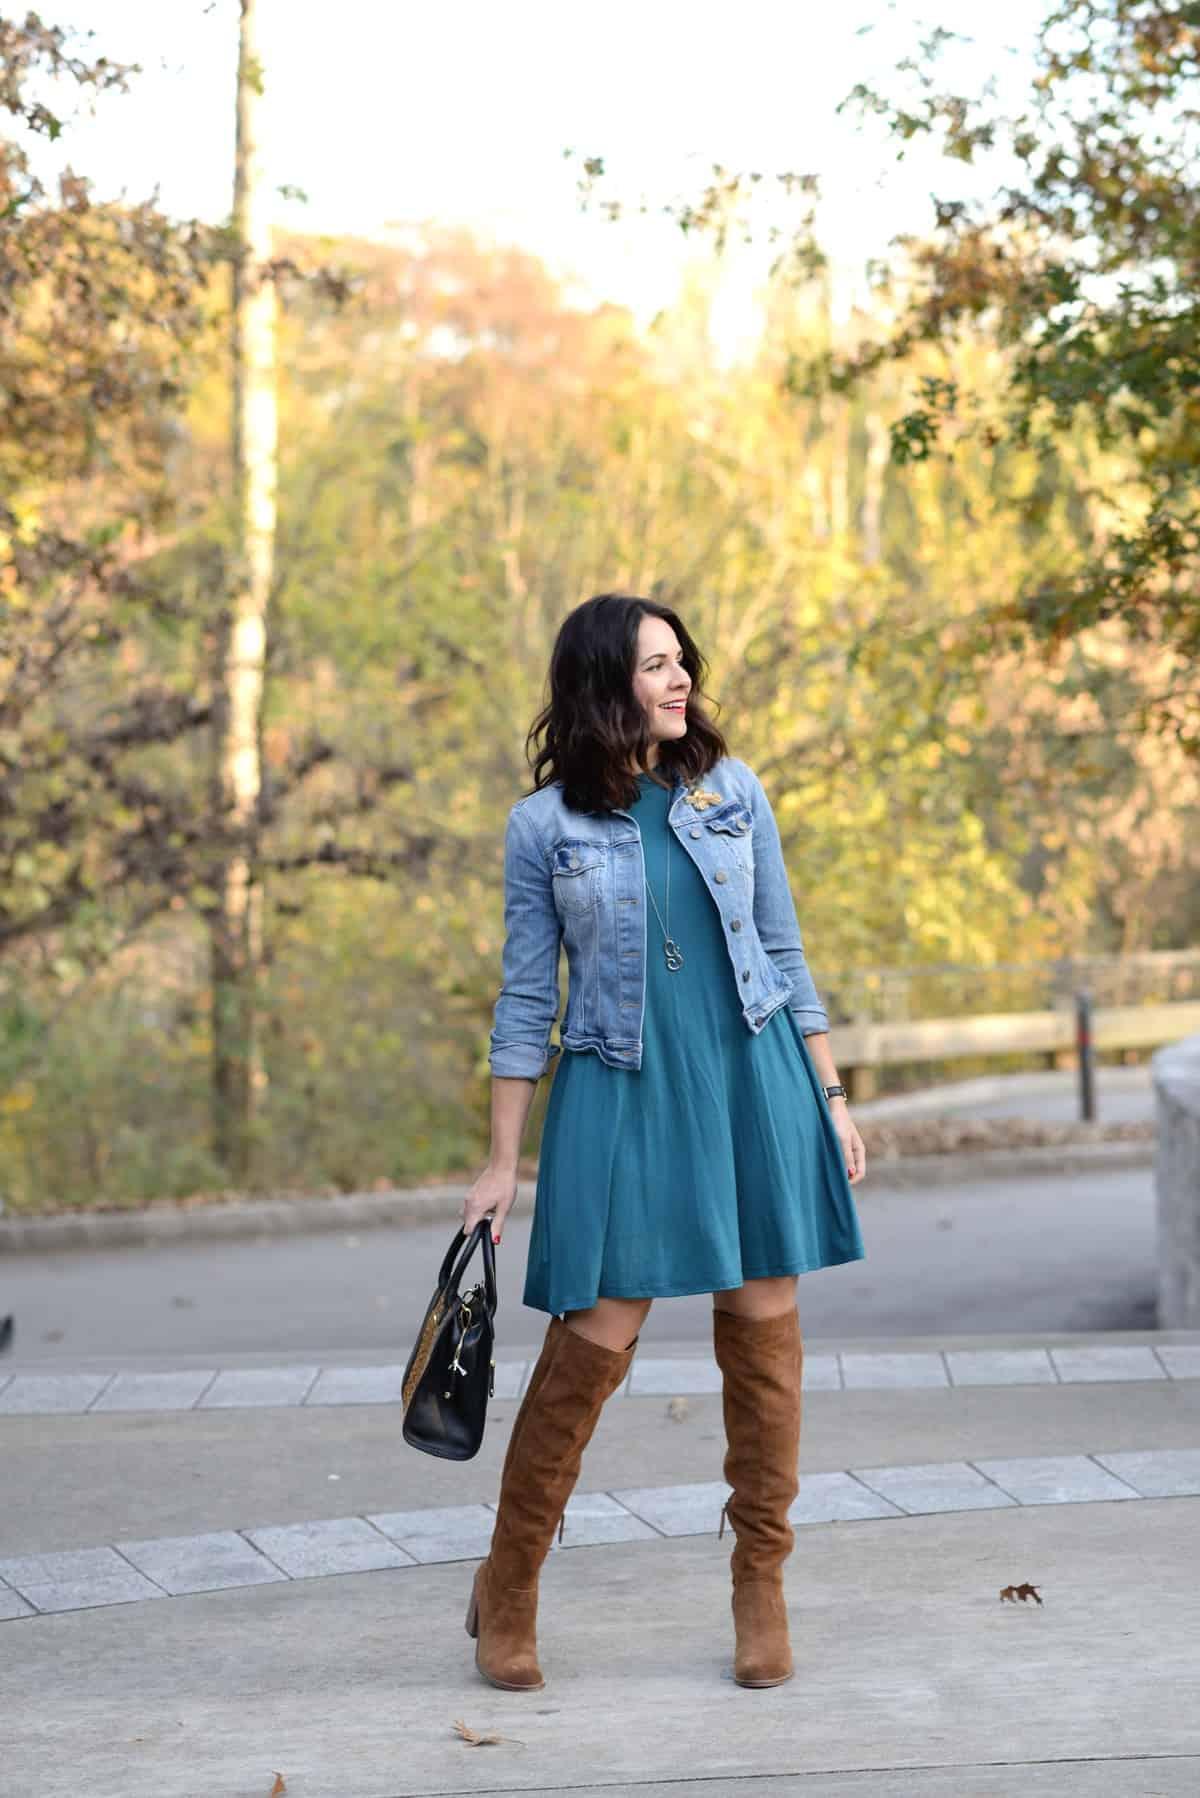 l.mae swing dress, fall outfit ideas - @mystylevita